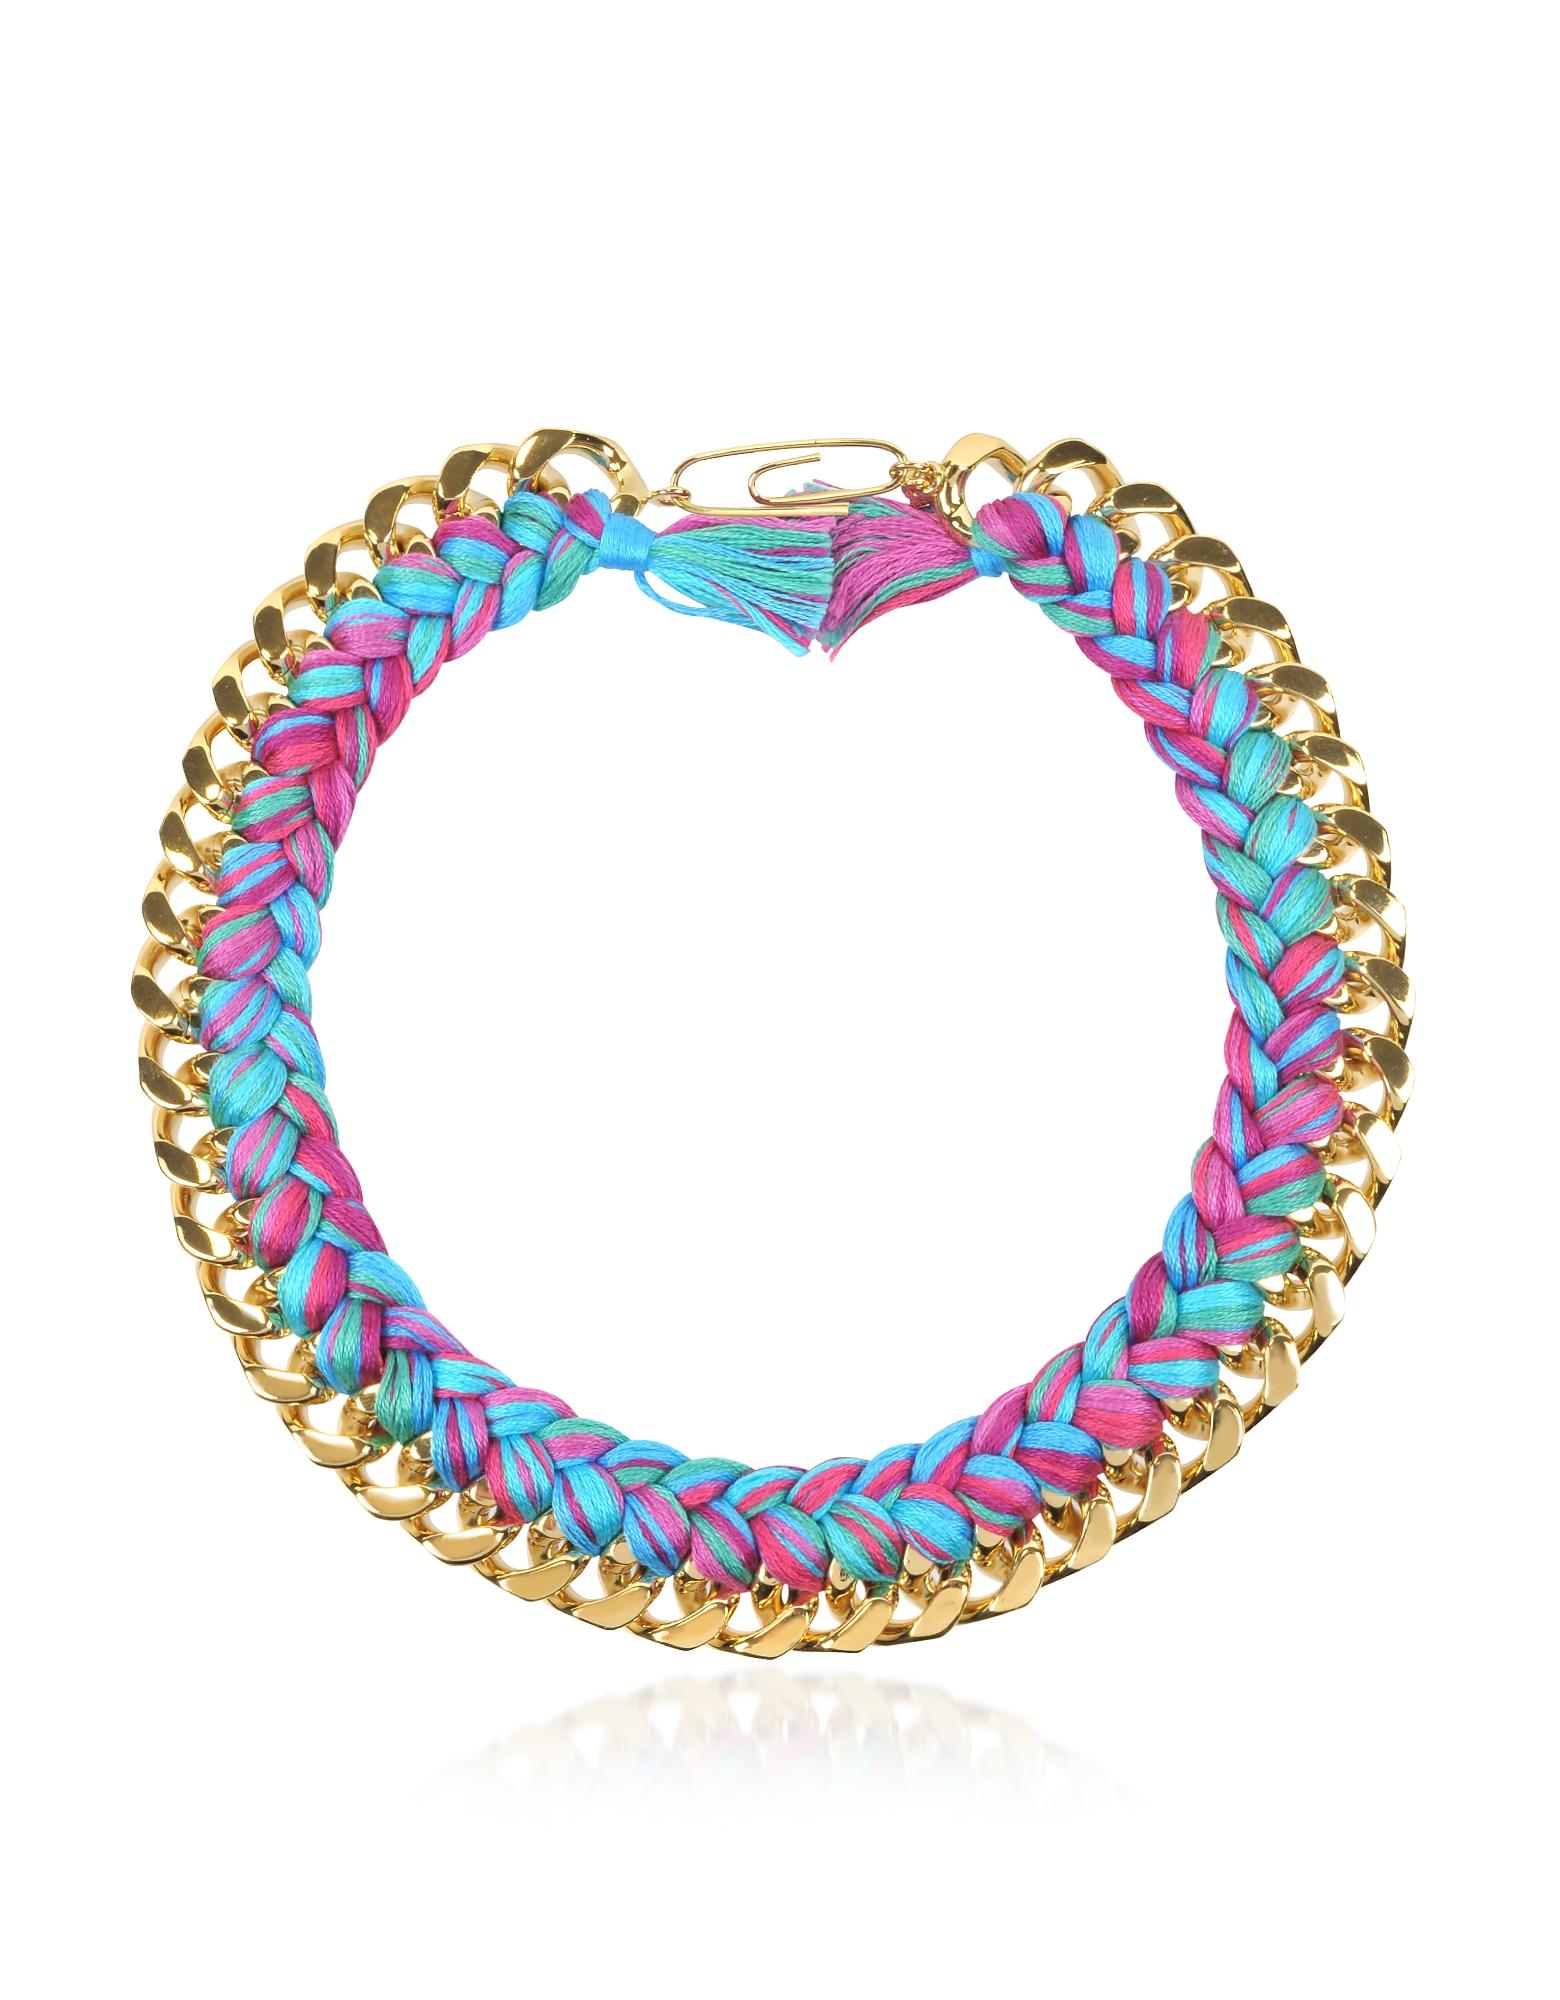 Aurelie Bidermann Necklaces, Do Brasil Gold and Cotton Necklace